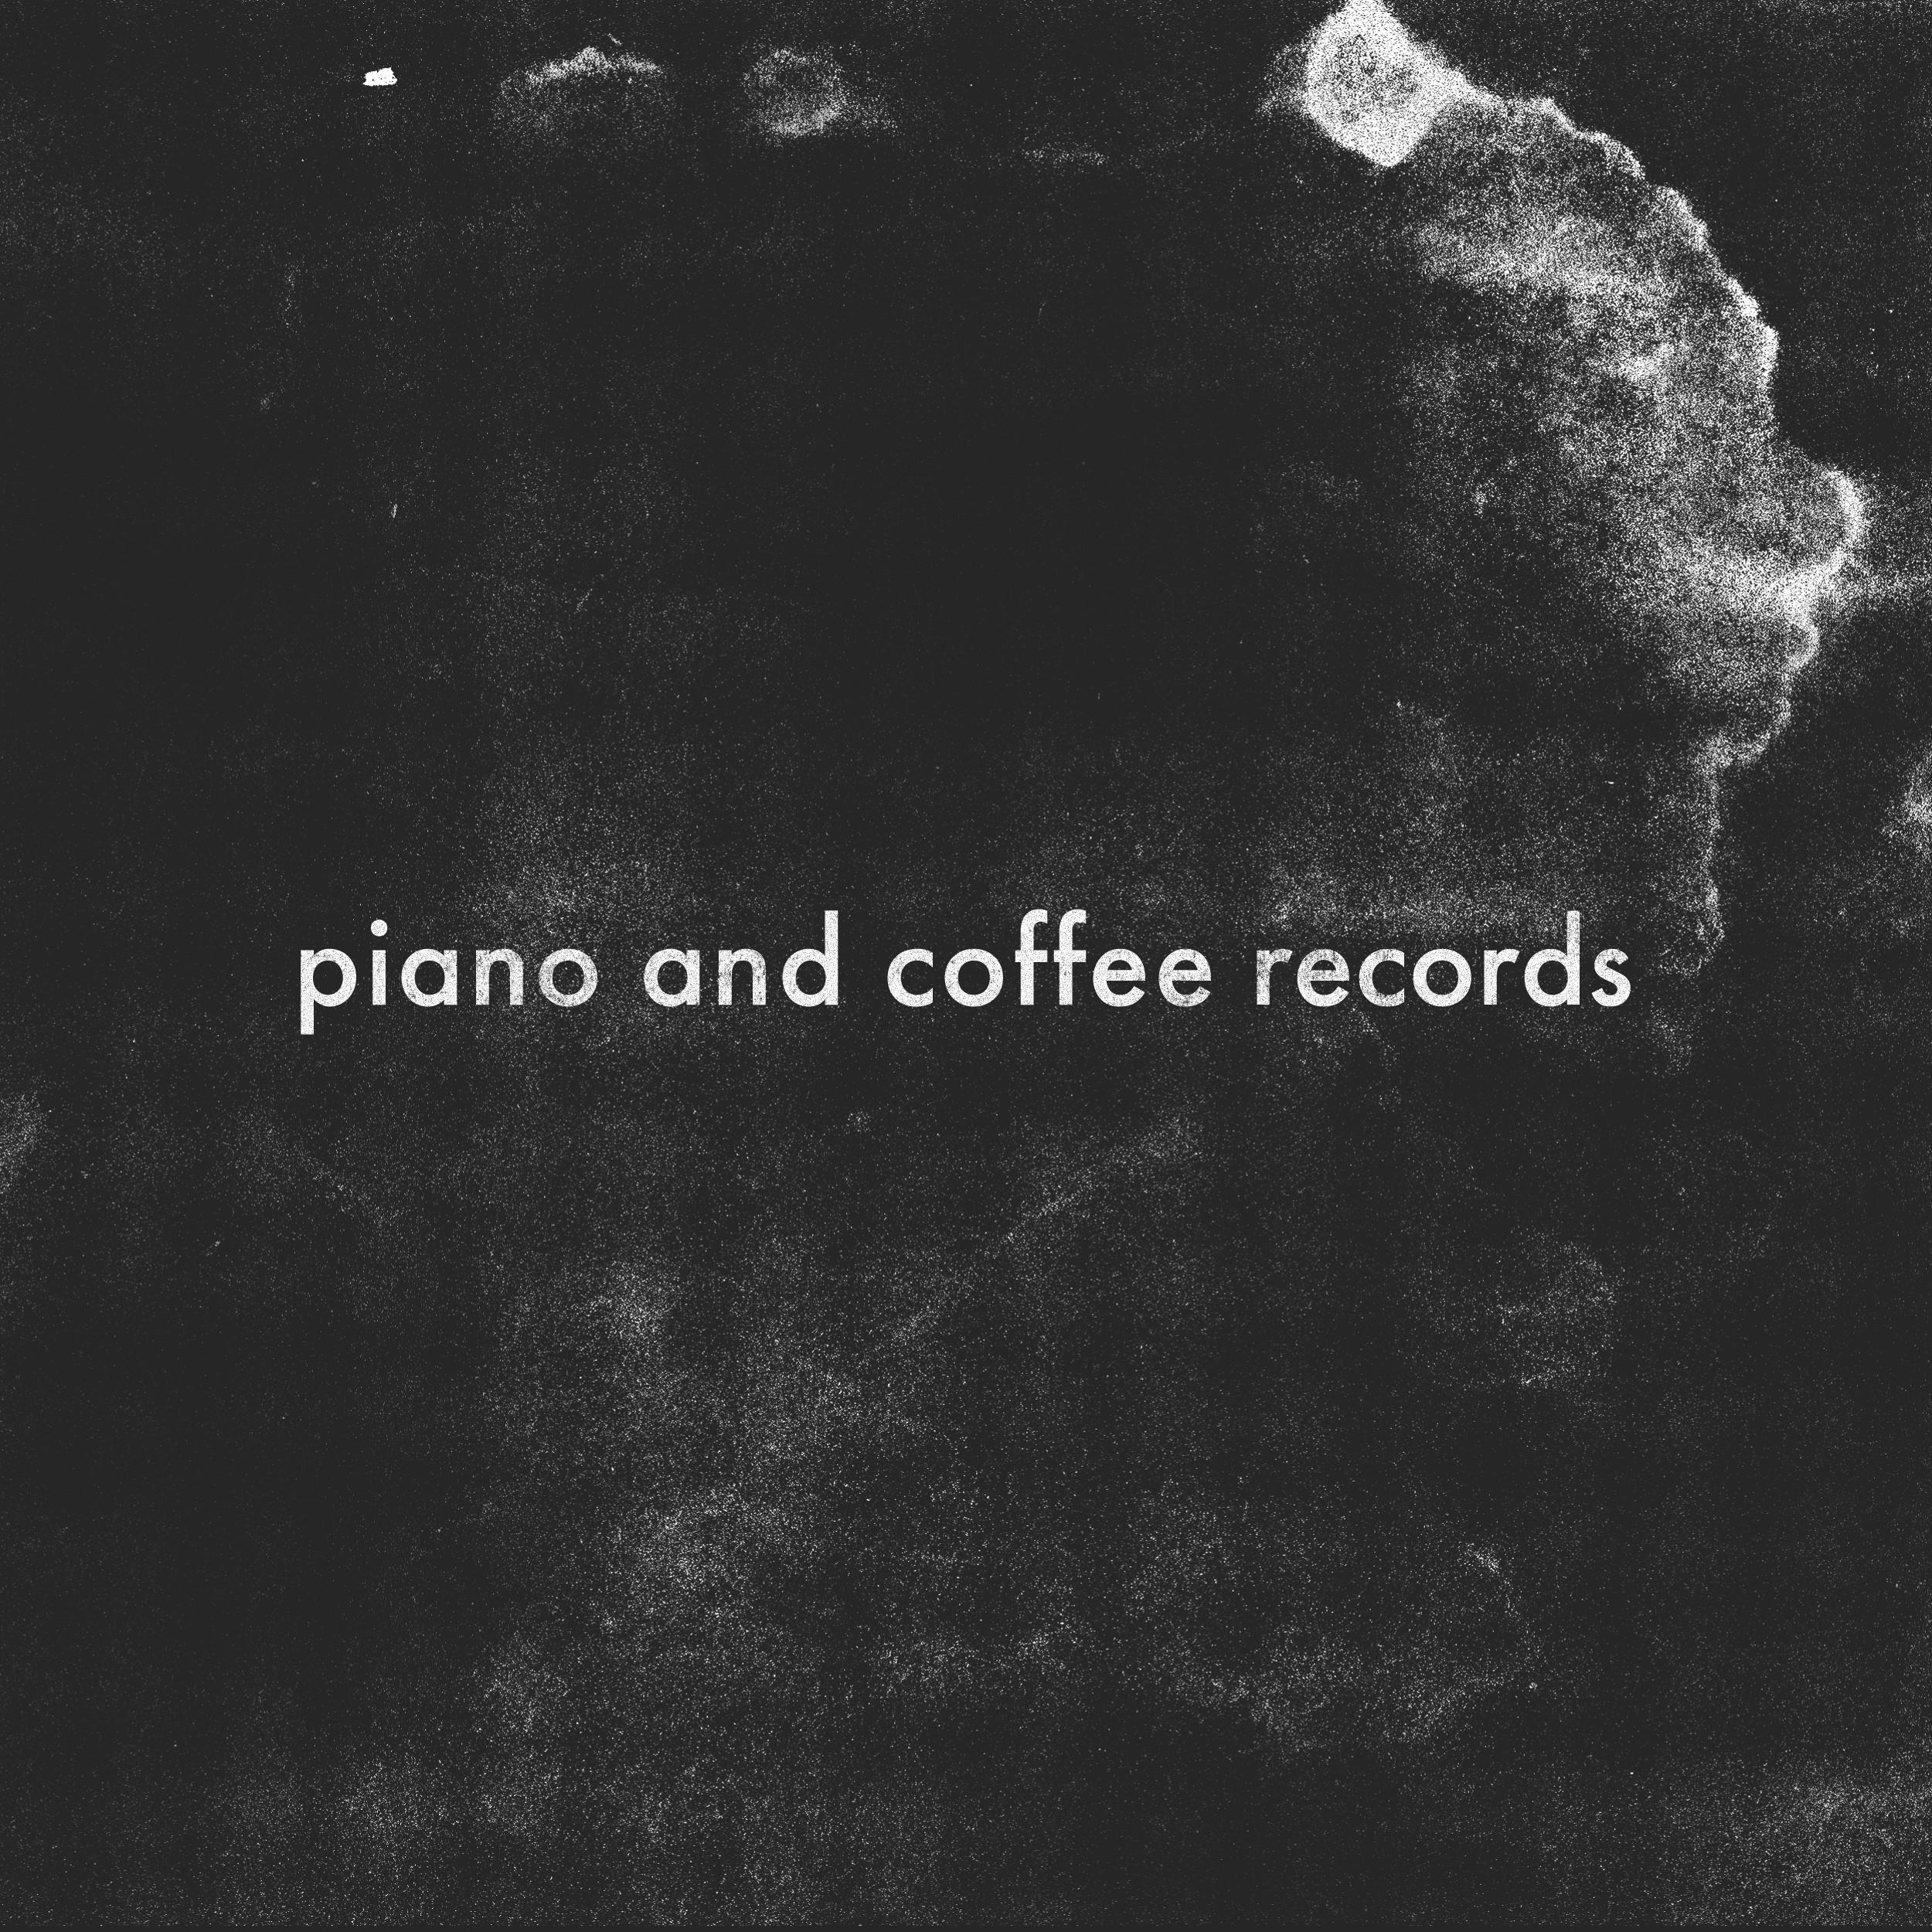 record label focuses internatio - pianoandcoffeerecords | ello